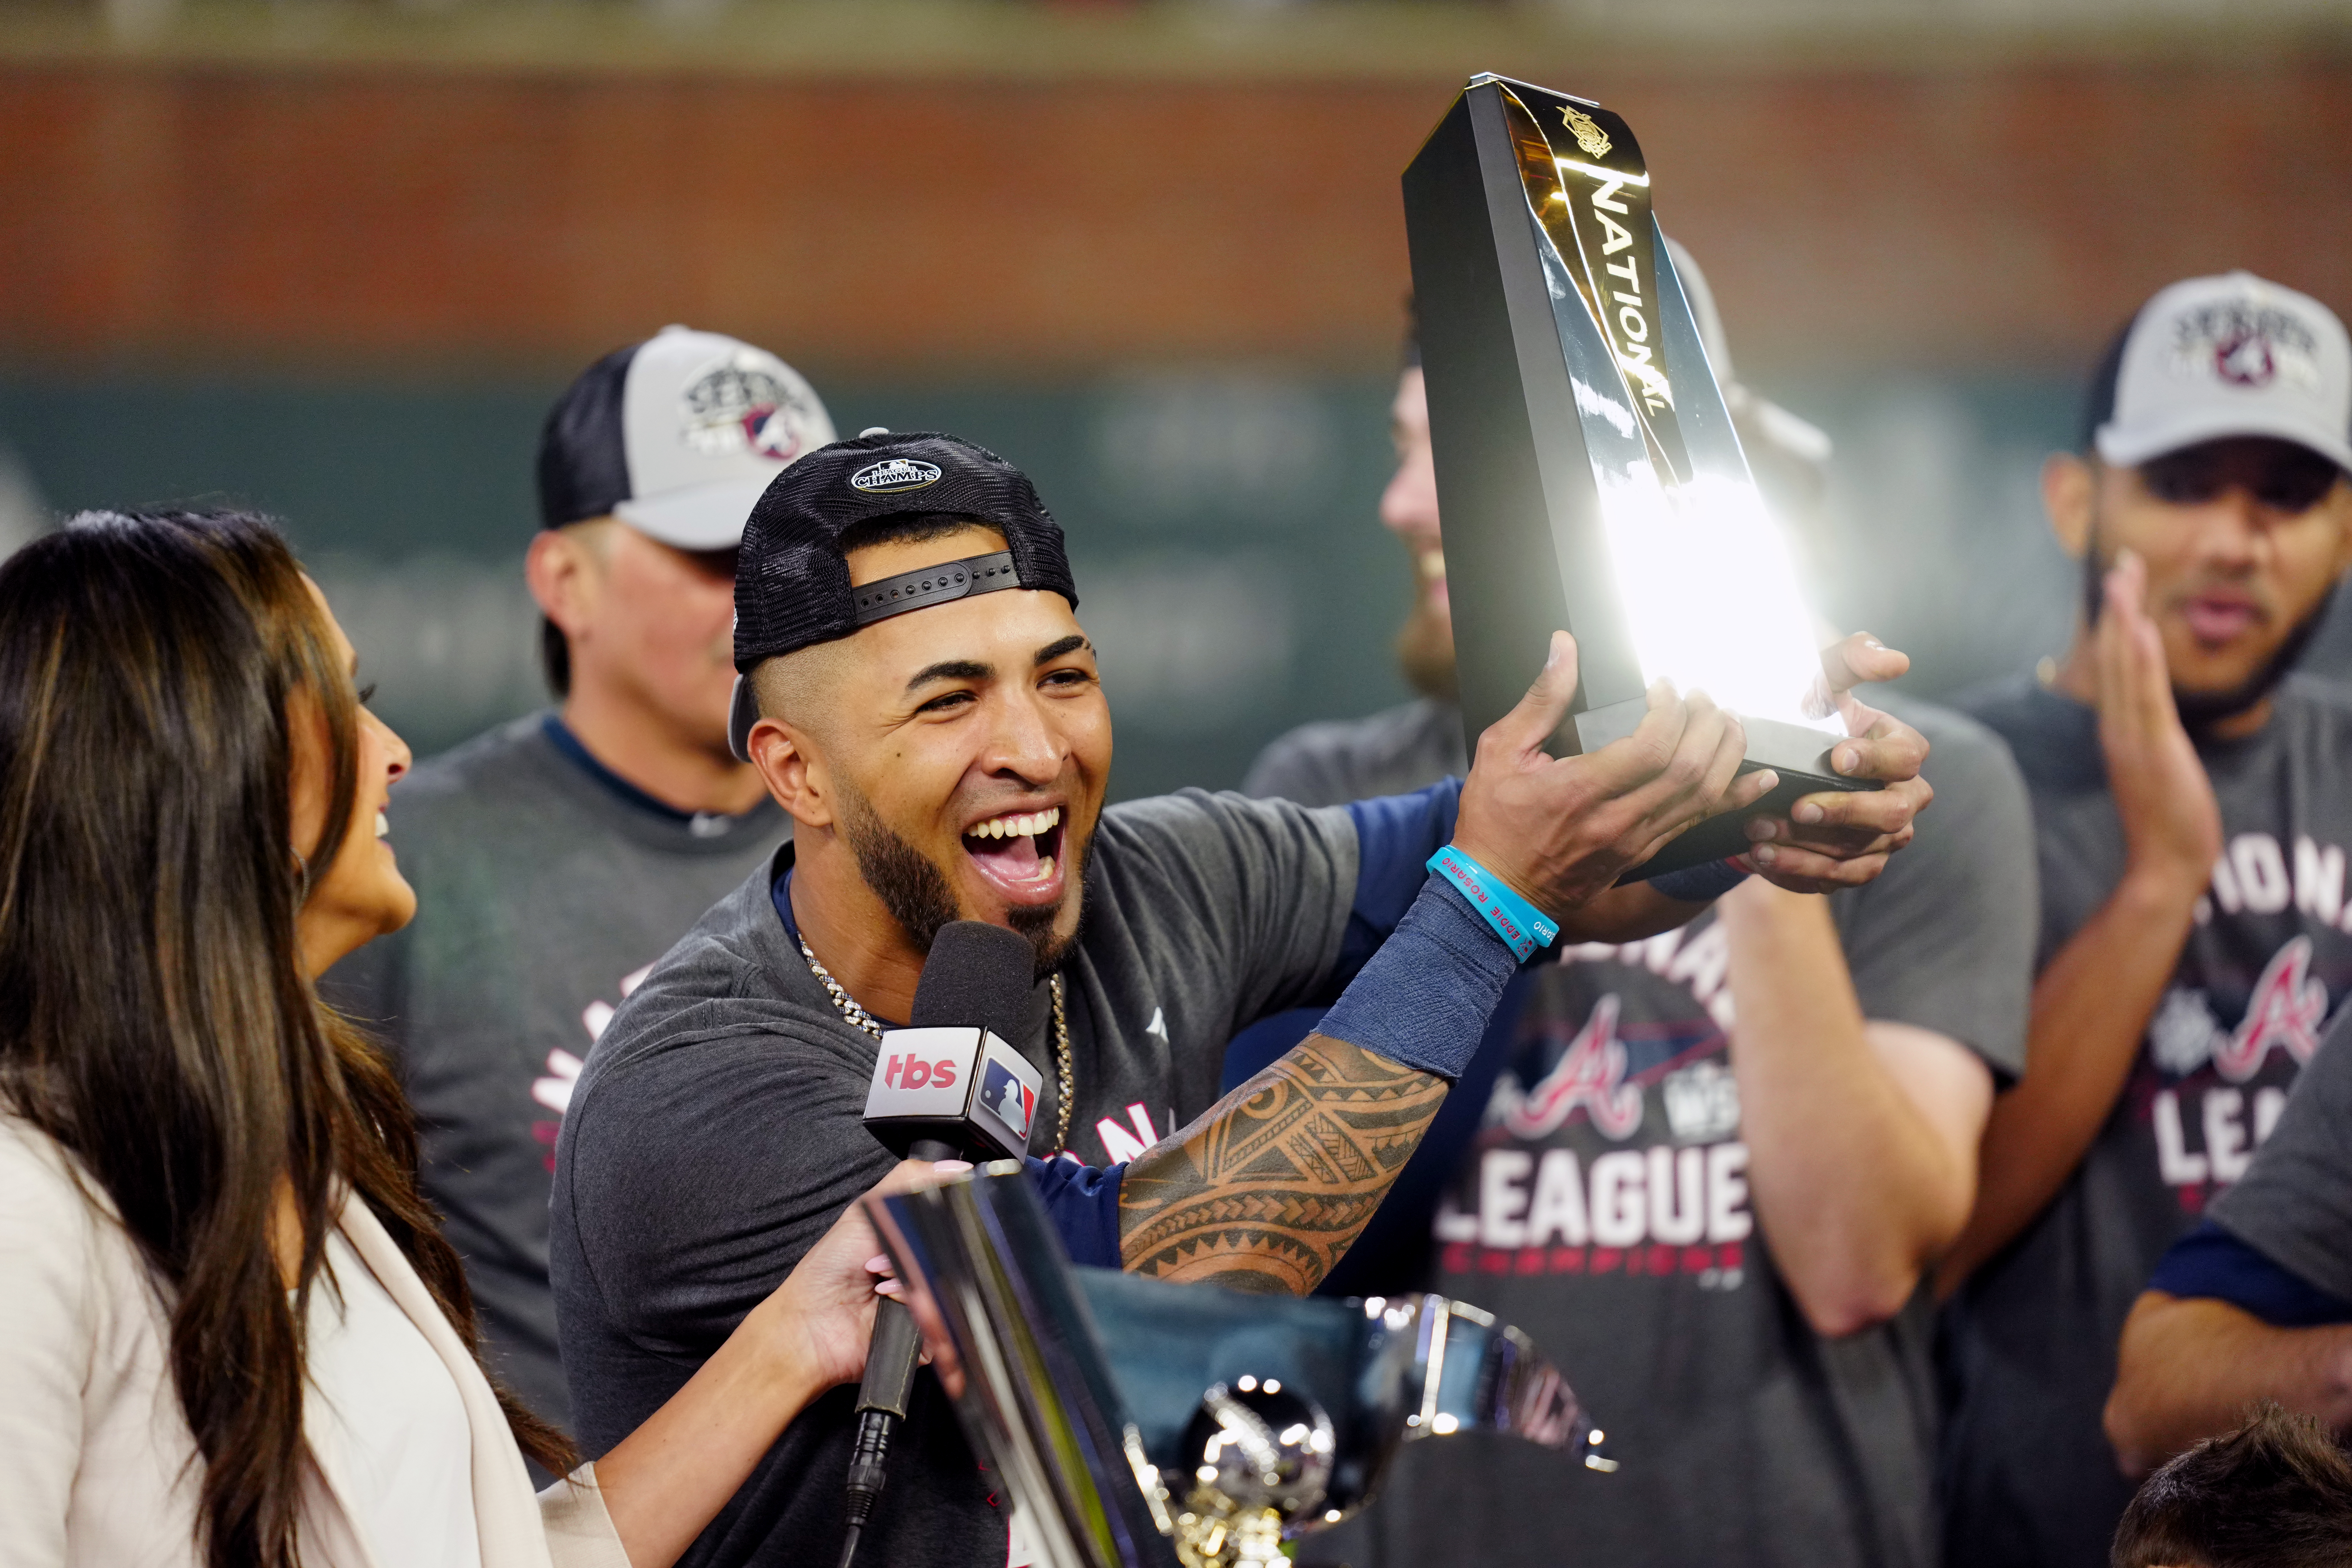 National League Championship Series Game 6: Los Angeles Dodgers v. Atlanta Braves